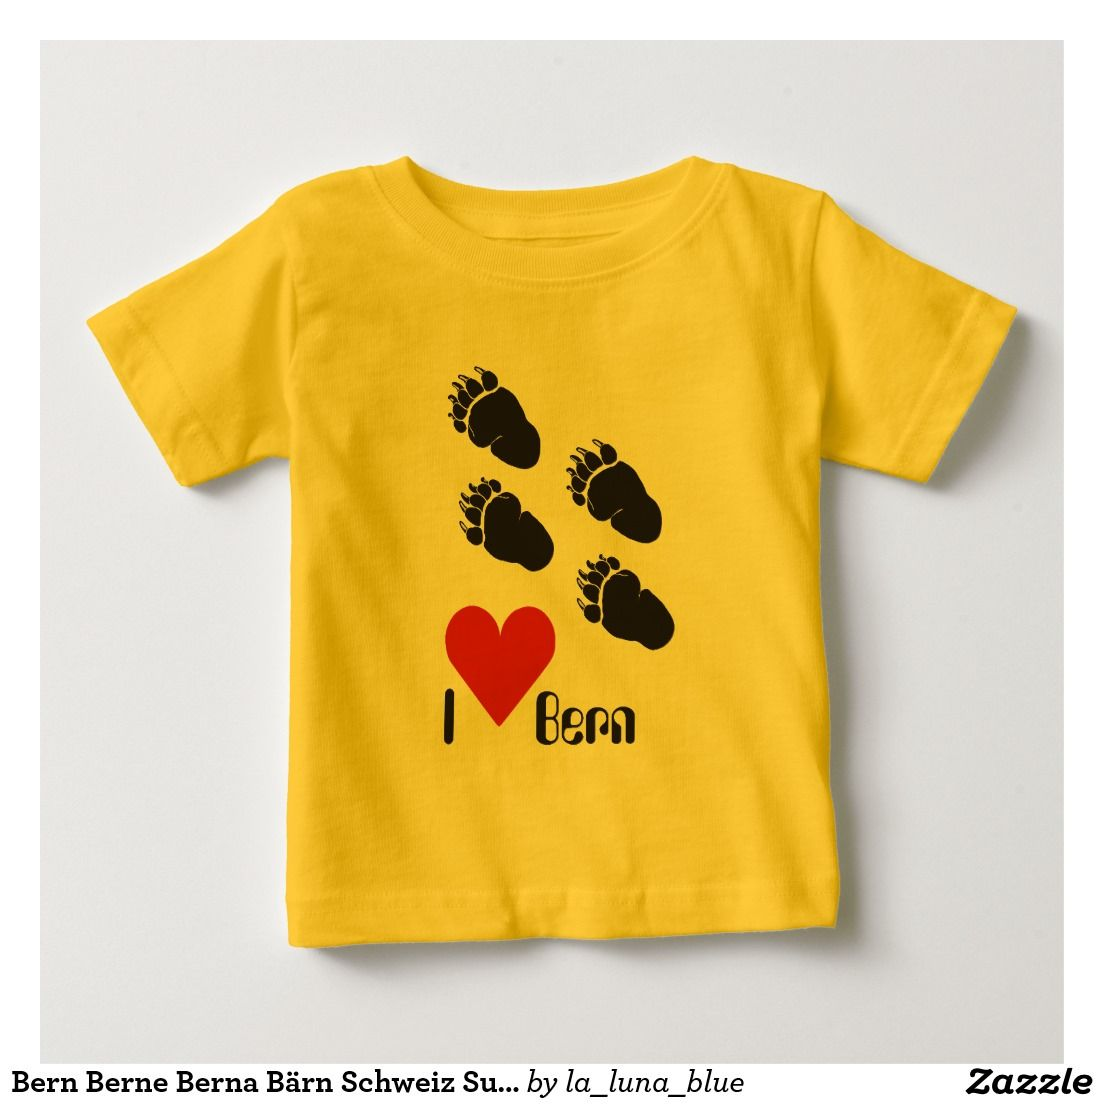 Bern Berne Berna Bärn Schweiz Suisse Svizzera Tshirt